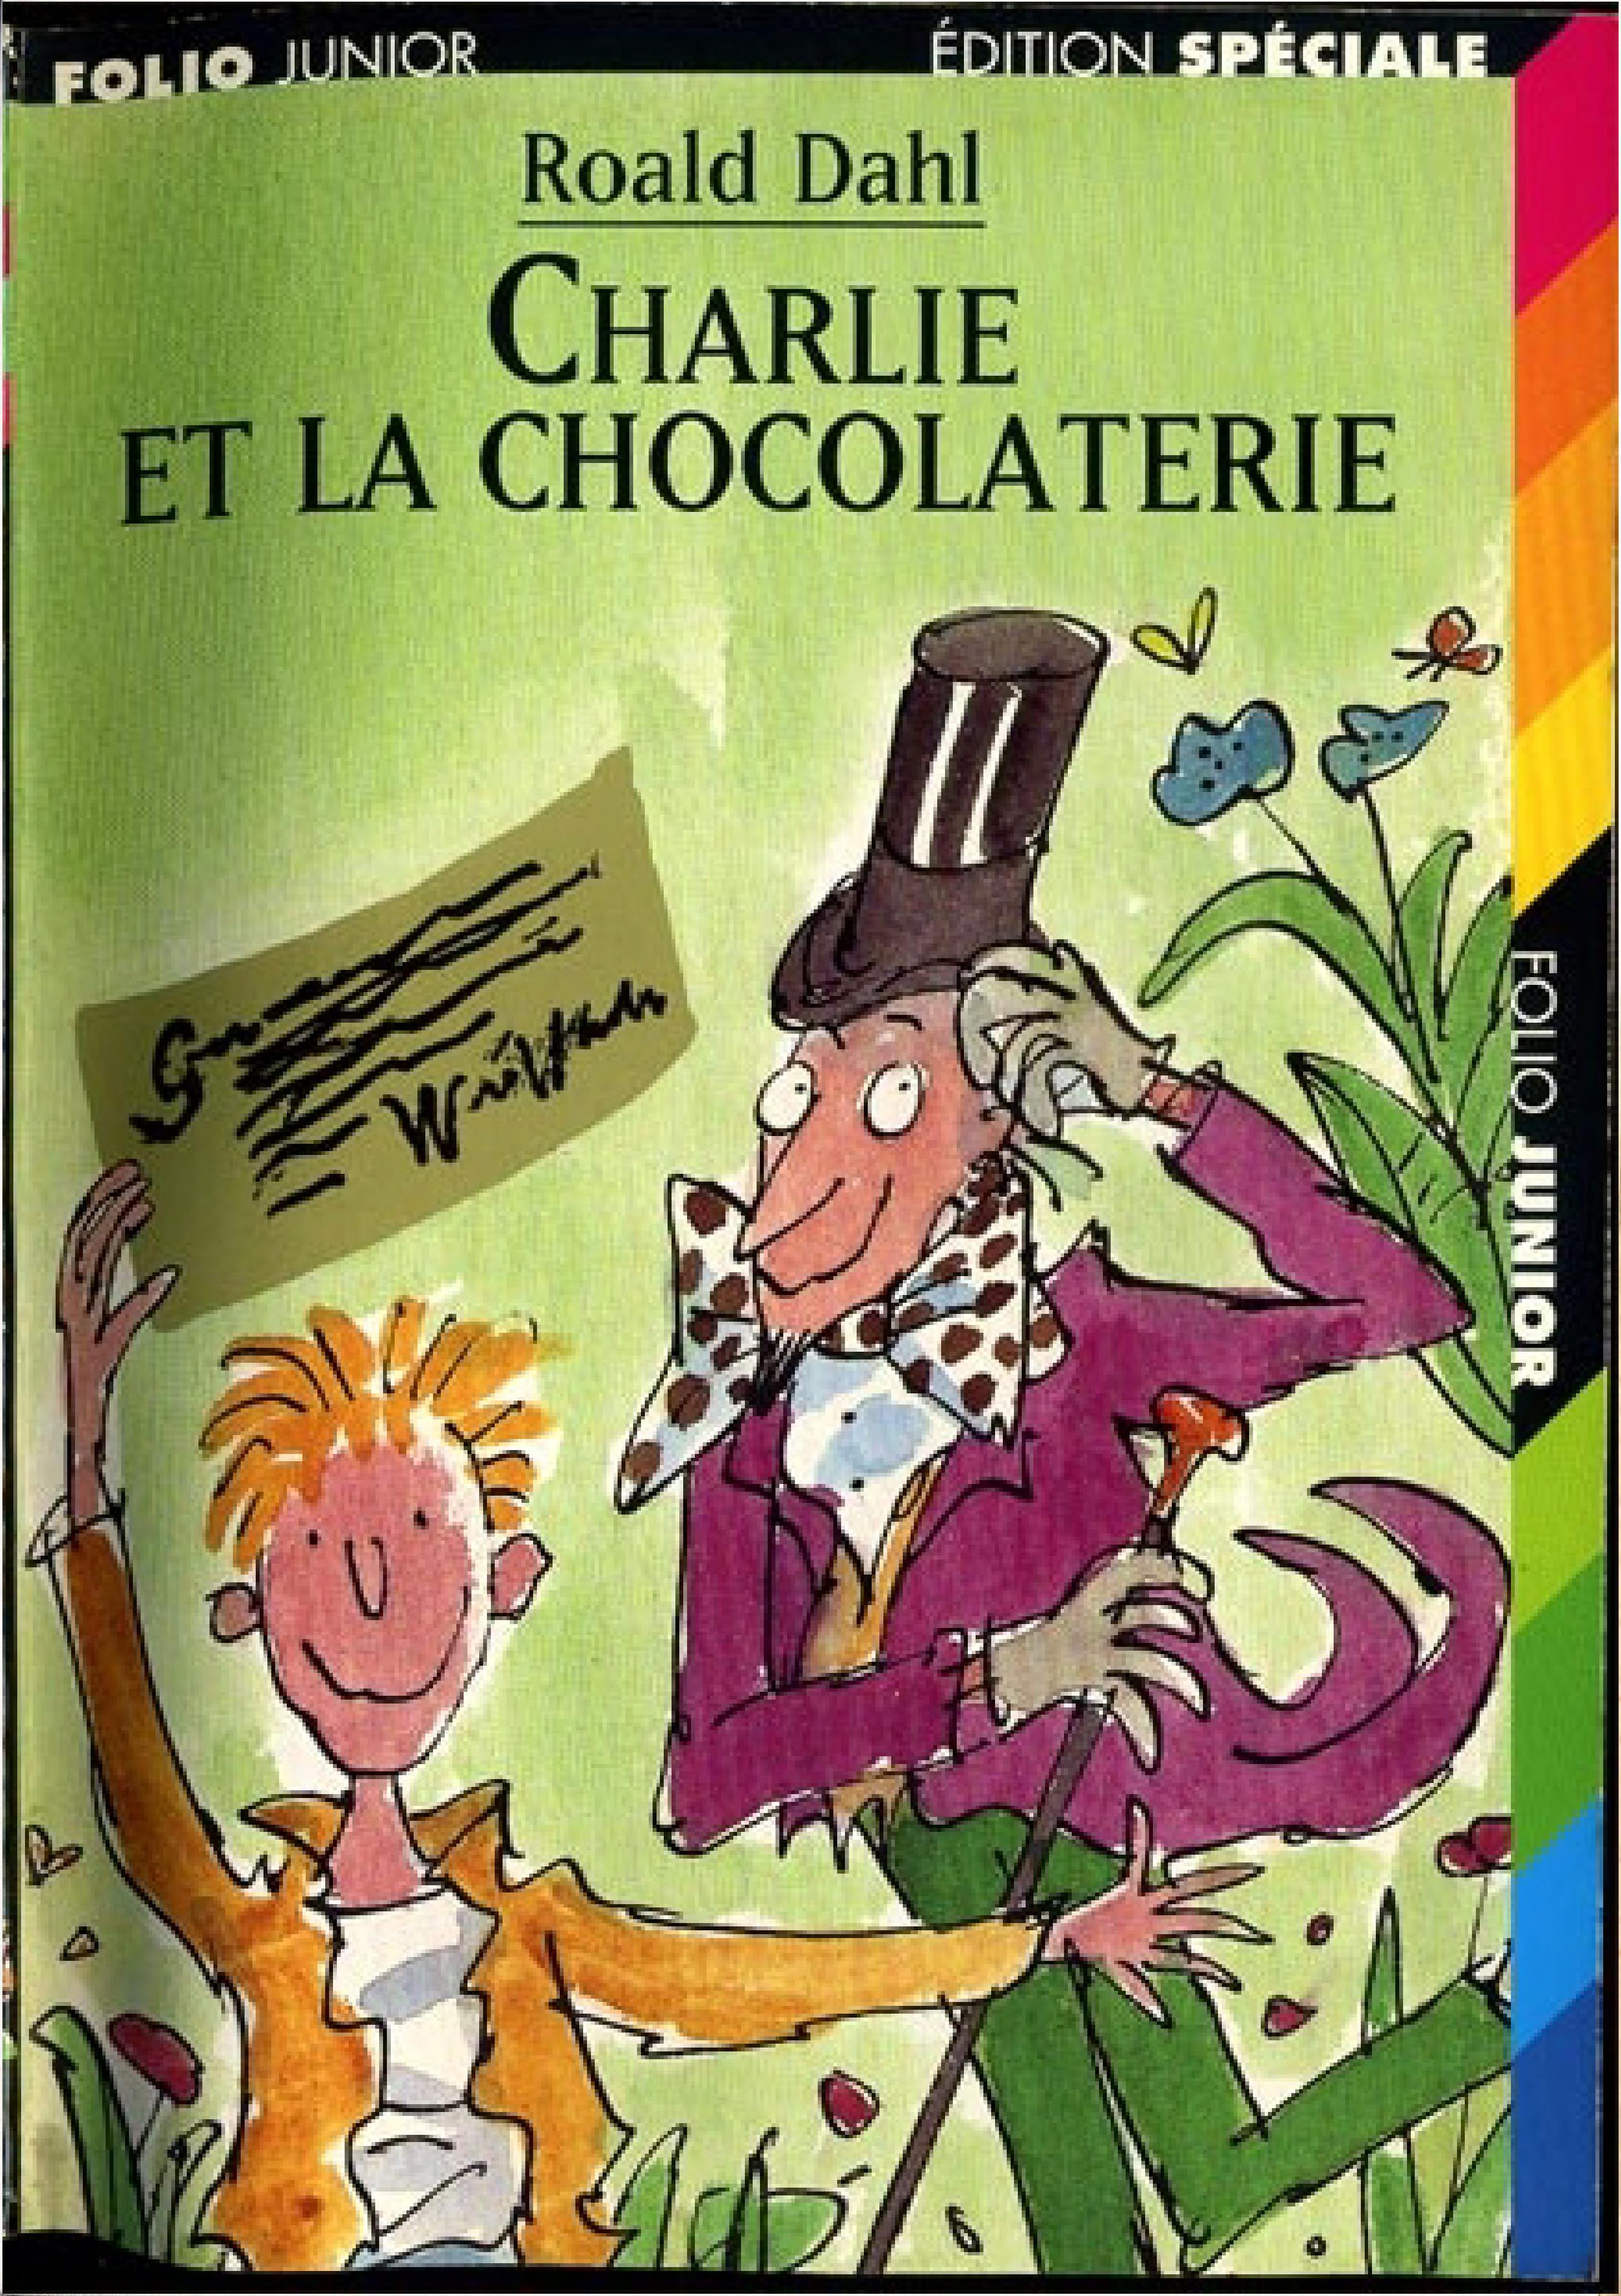 Charlie et la chocolaterie - Roald Dahl - Edition Folio Junior - PDF